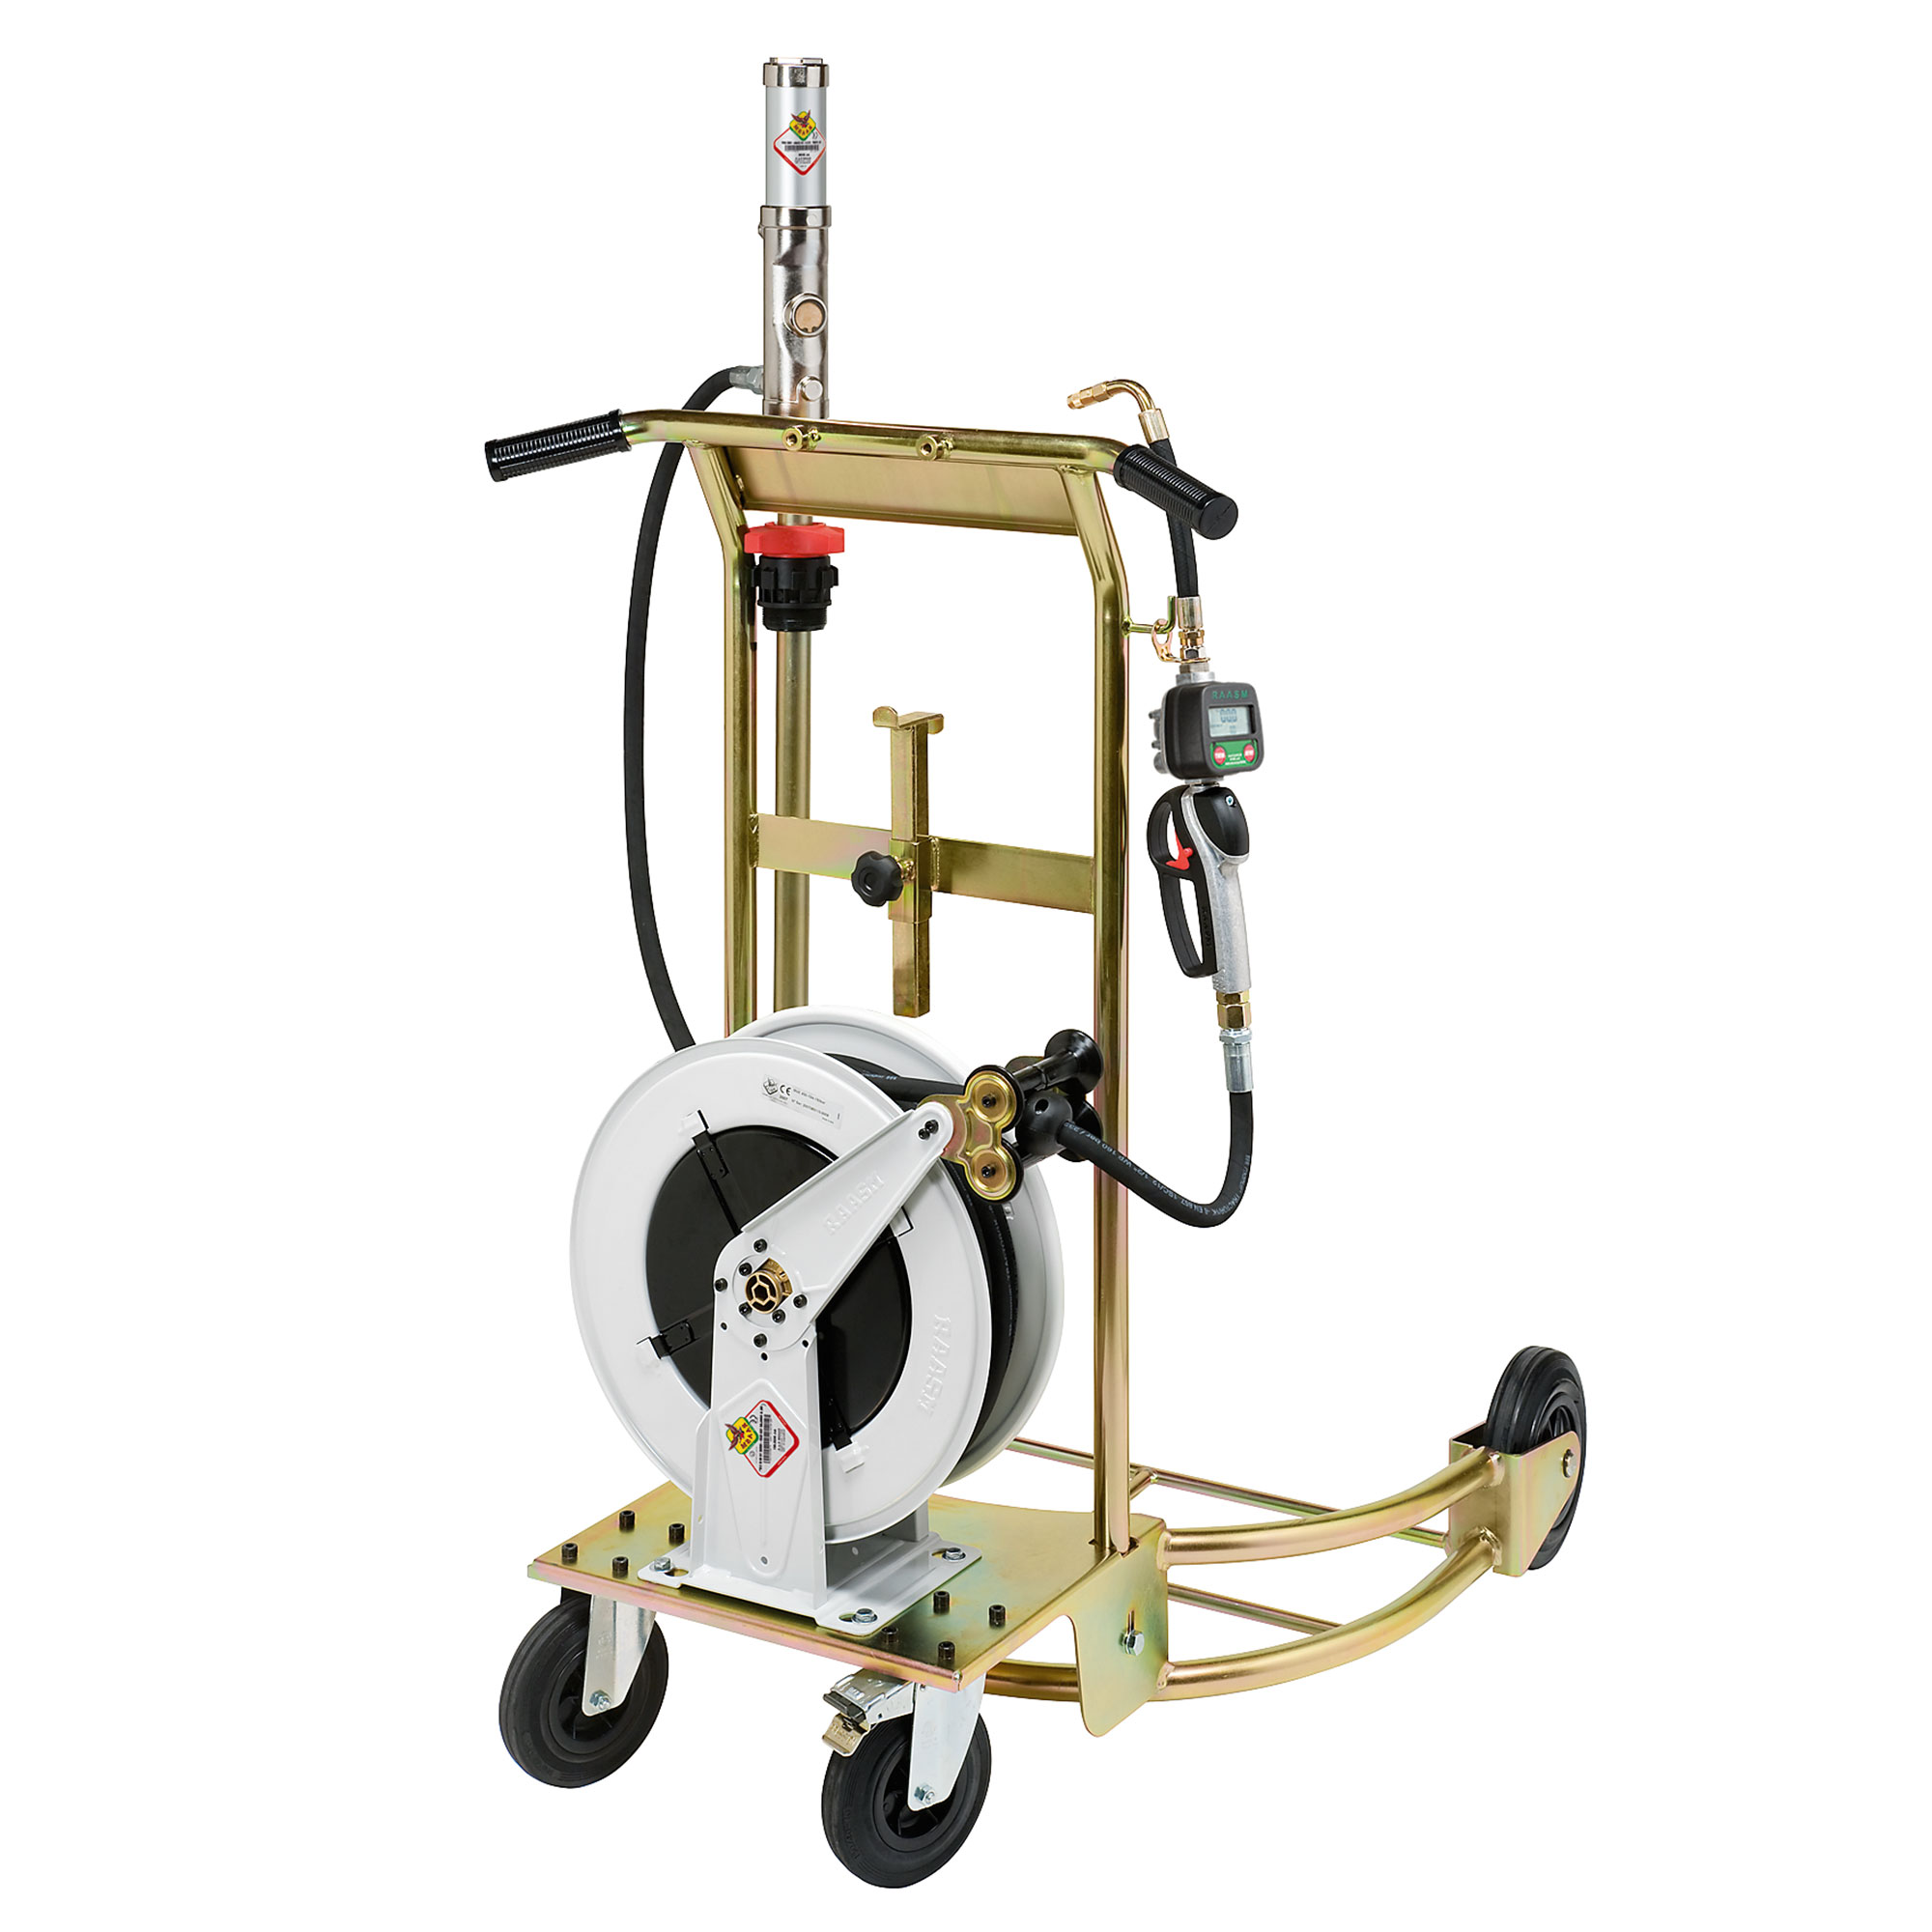 37099 - 5:1 Ratio High Volume Trolley Dispensing Kit